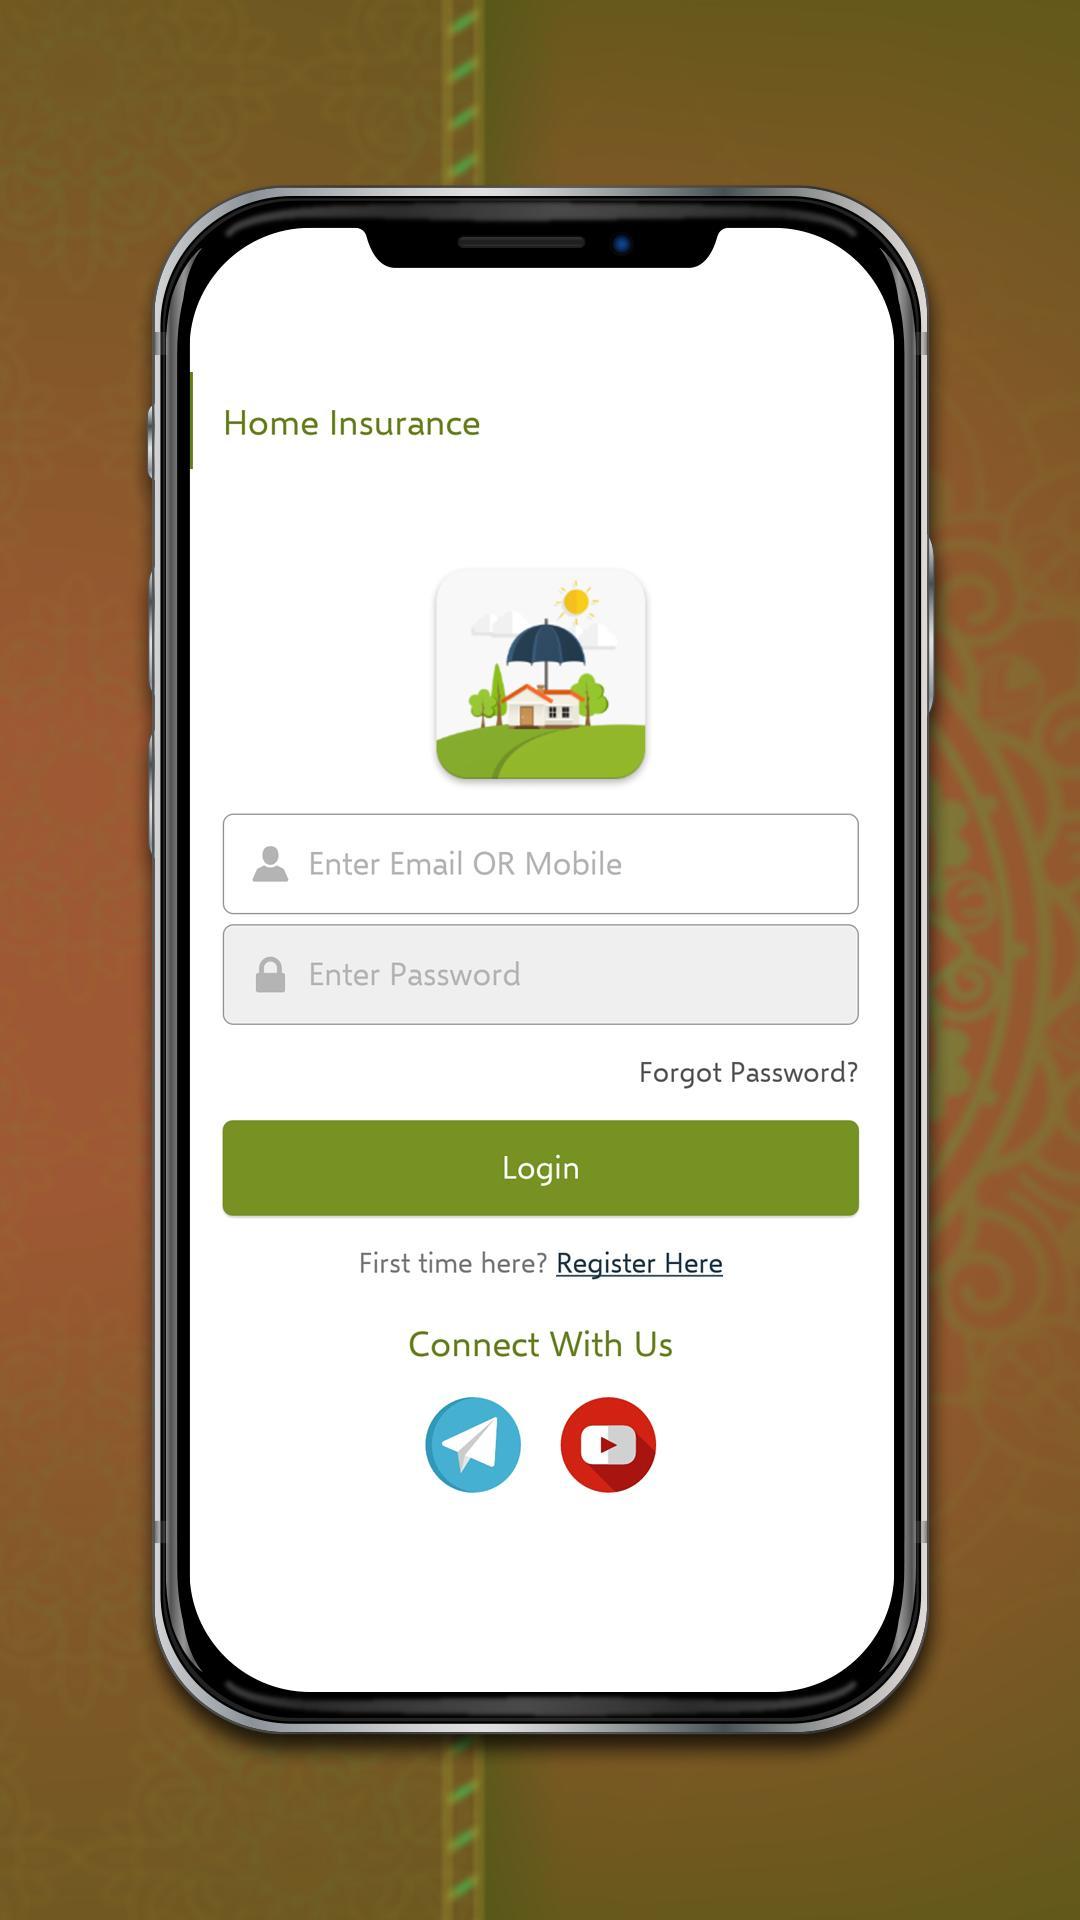 Home Insurance Apk Download – Home Insurance Apk App – Home Insurance Apk Client New 2021* 3